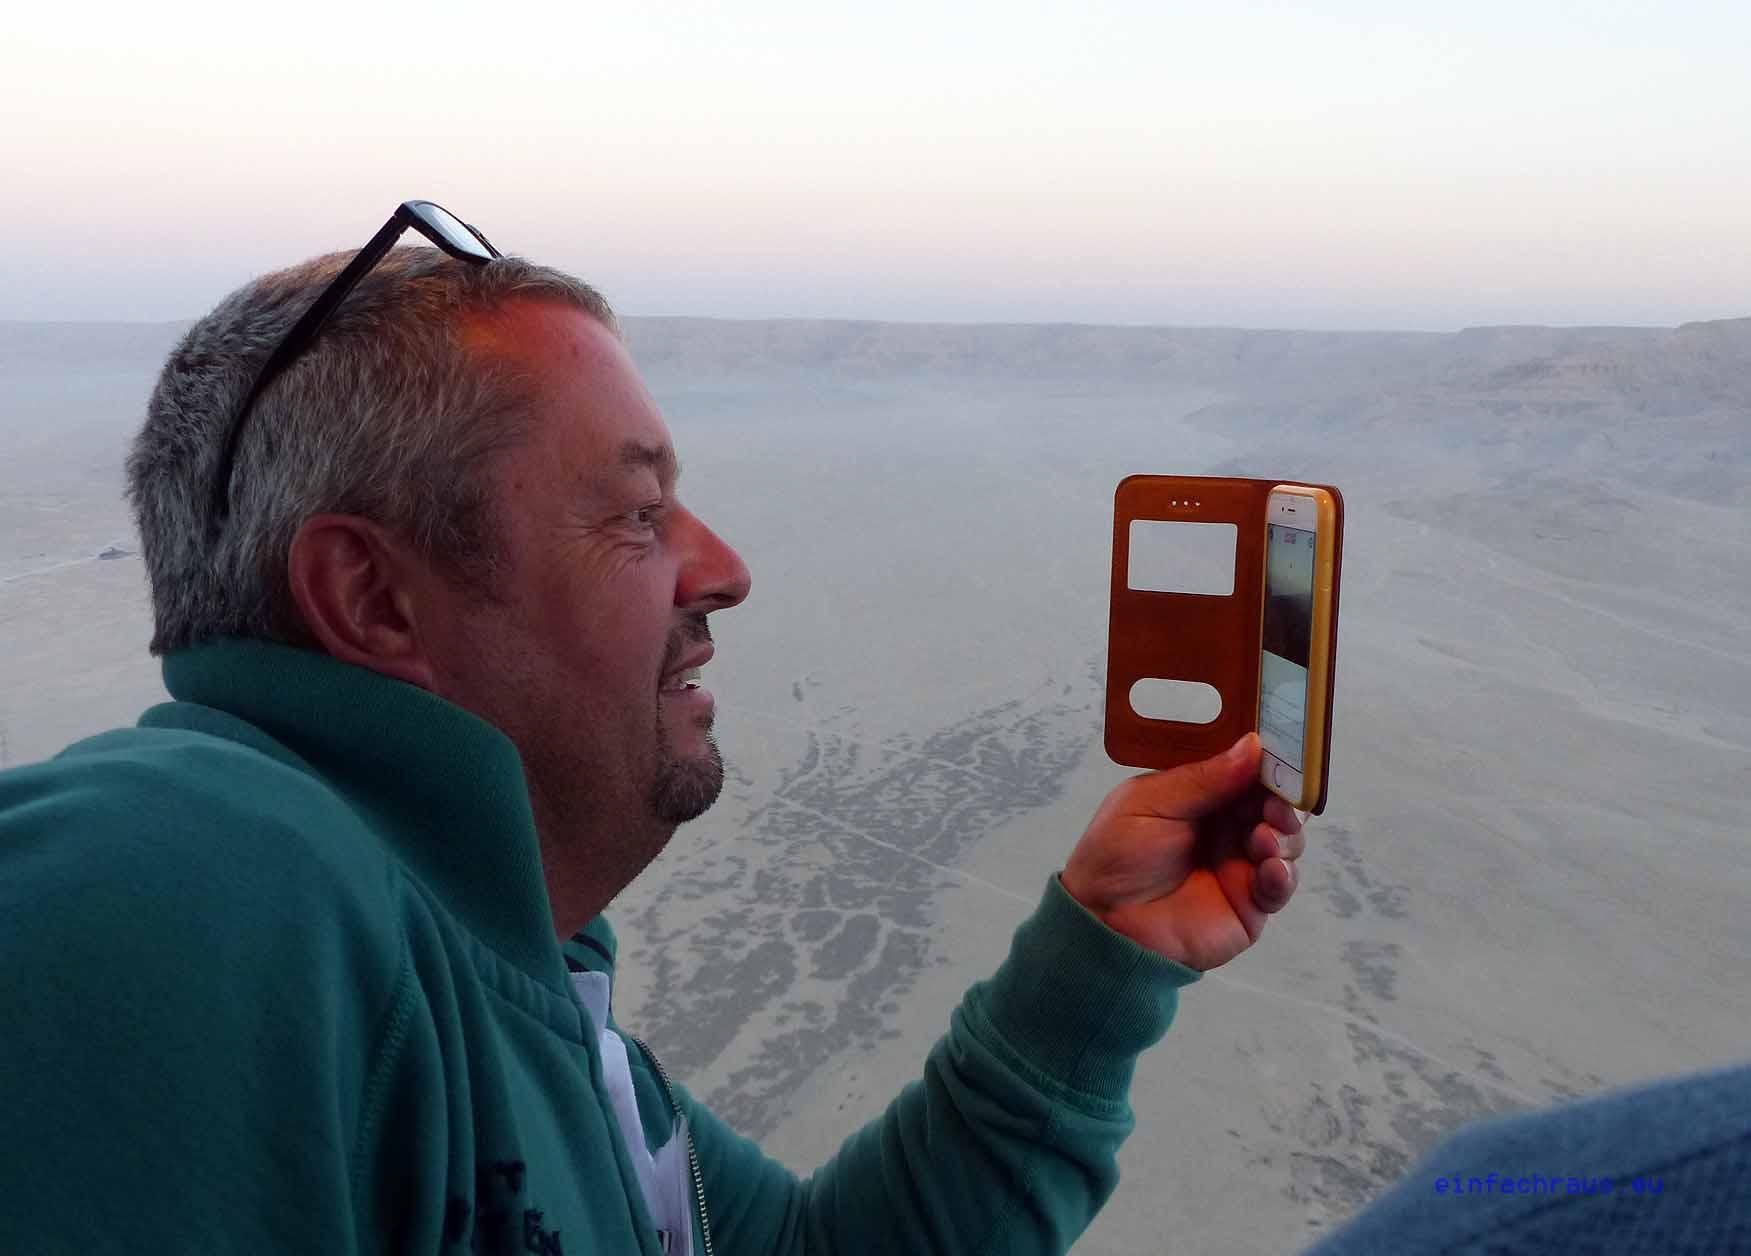 Ägypten-Experte und sonnenklar. https://youtu.be/tEXO8Q2_qWY TV - Reporter Andreas Diefenbach bei der Livesendung, Foto: D.Weirauch